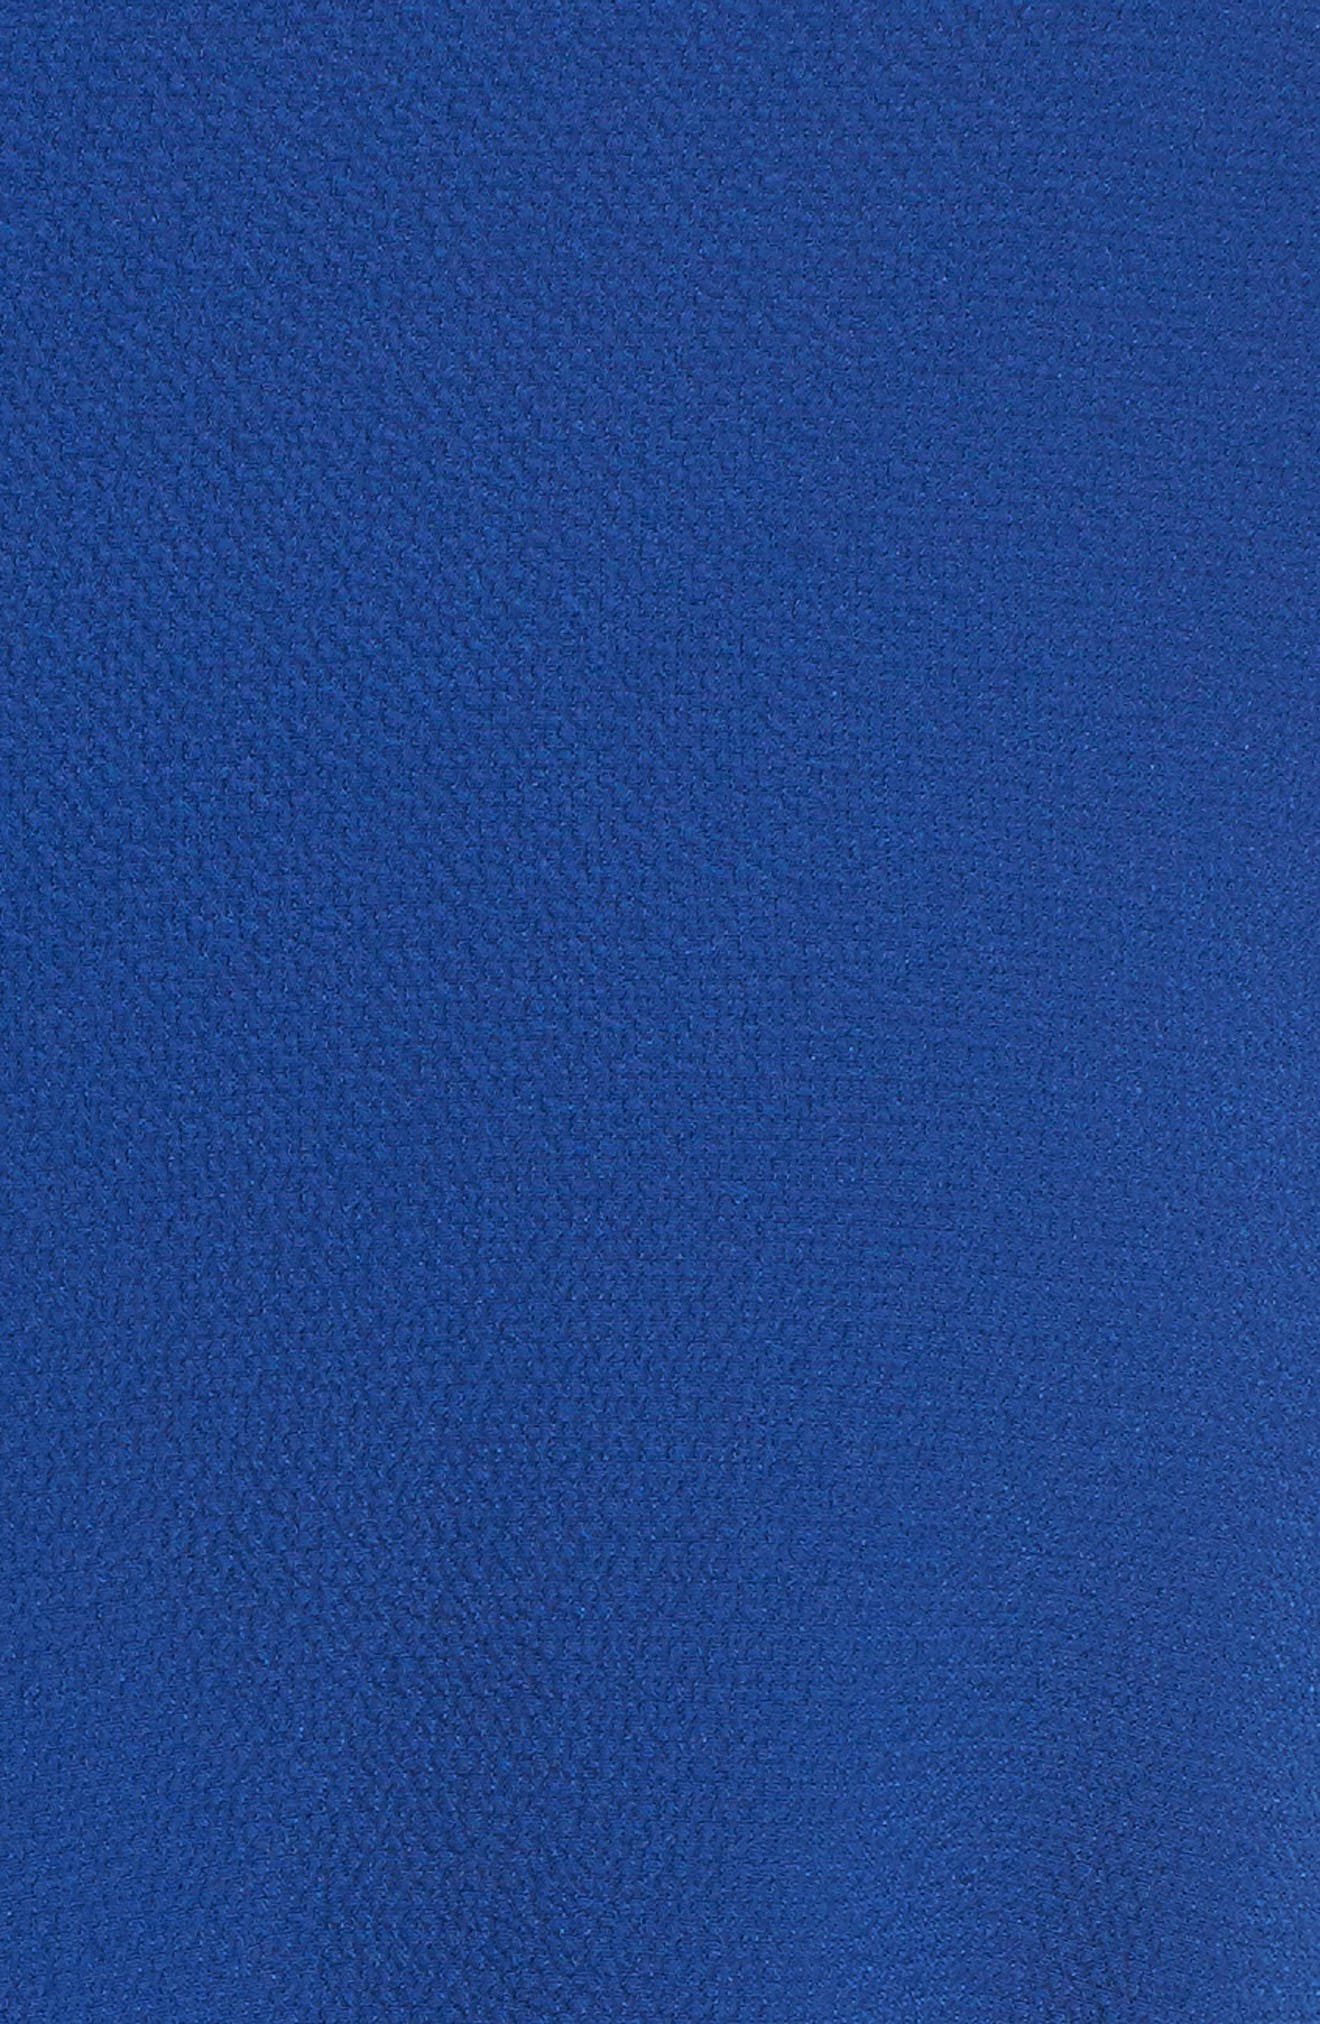 Stretch Crepe Dress,                             Alternate thumbnail 24, color,